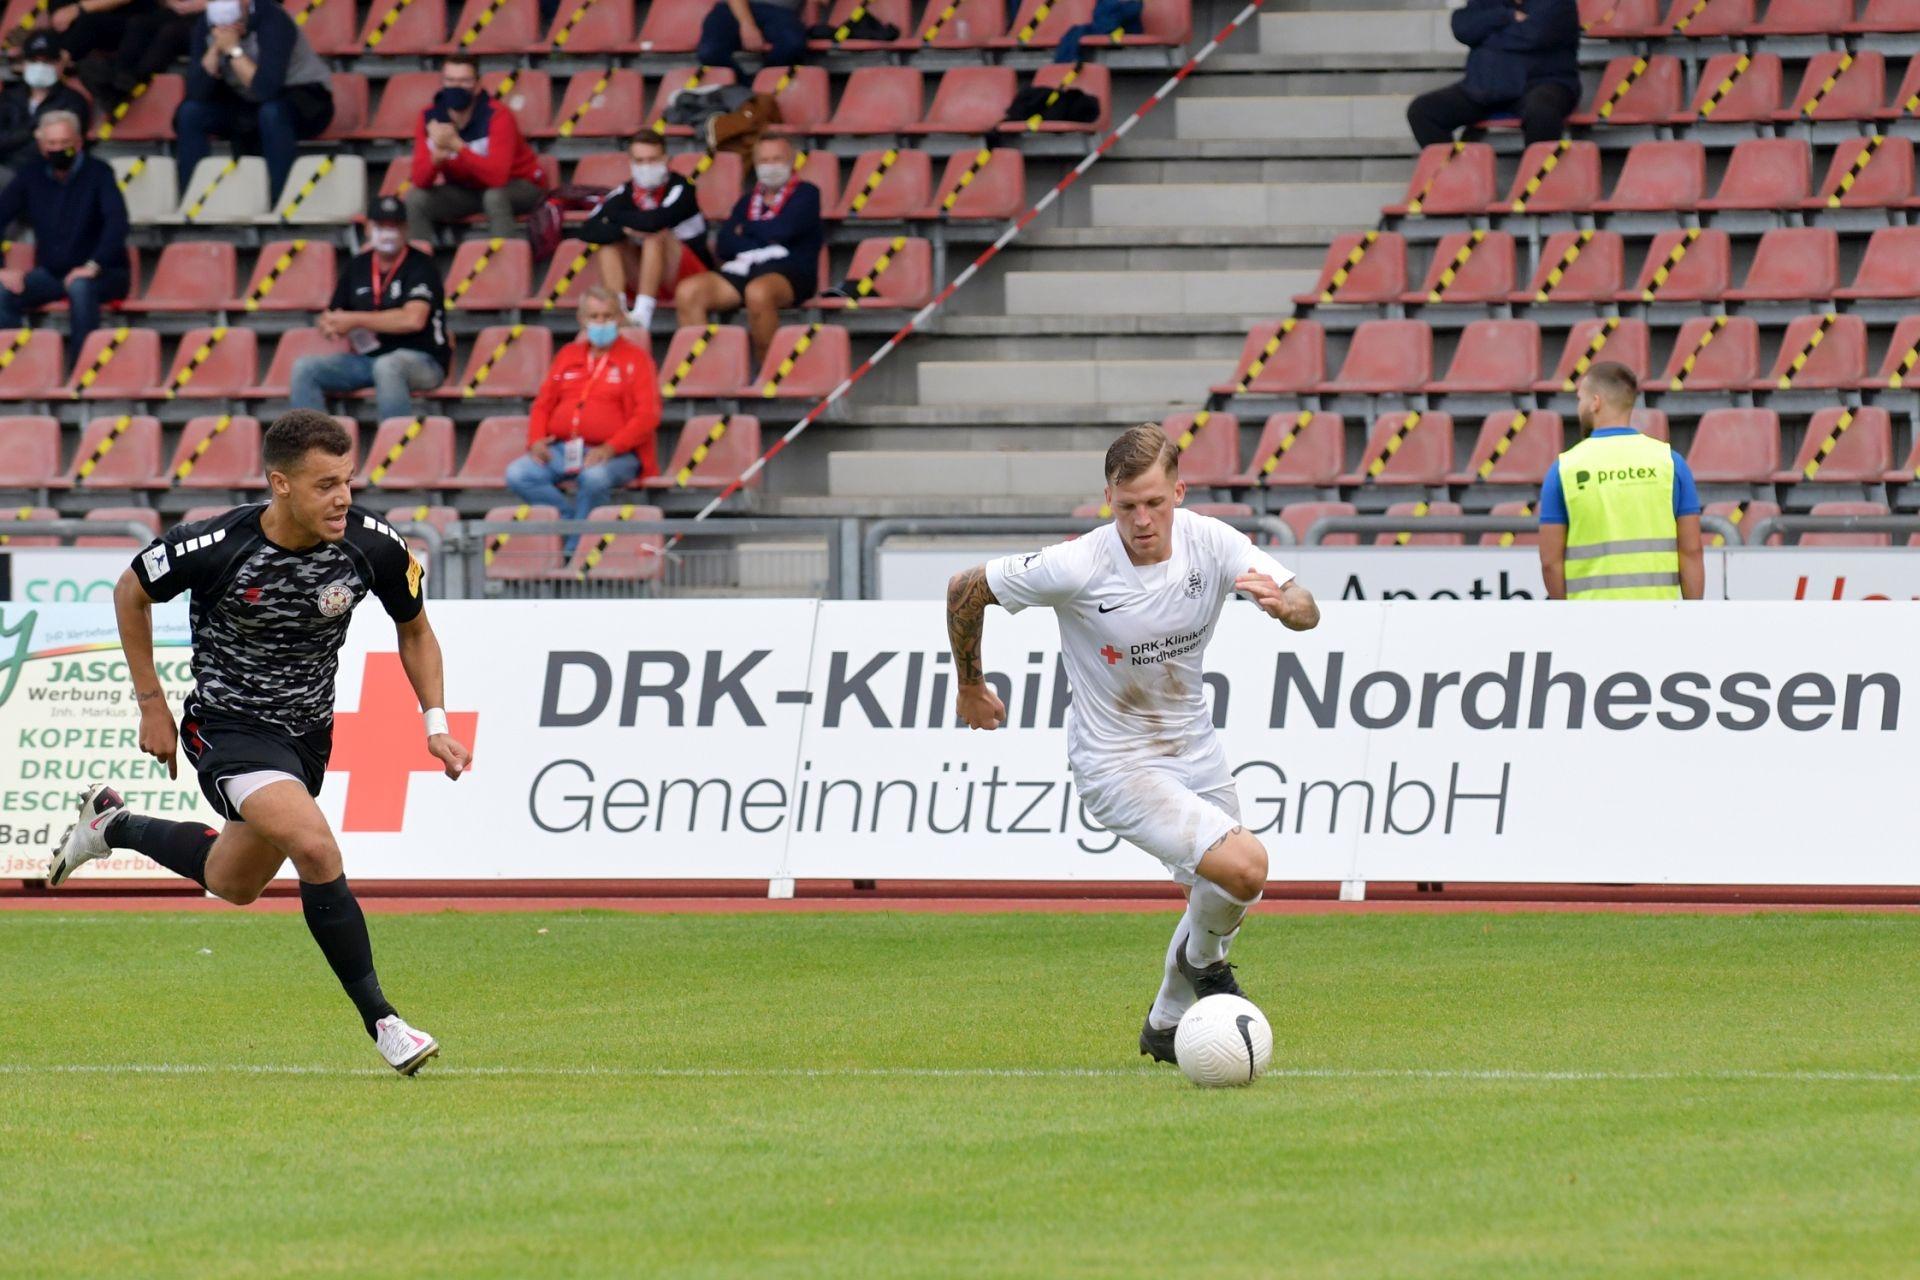 Regionalliga Südwest 2020/21, KSV Hessen Kassel, Rot-Weiss-Koblenz, Endstand 1:1, Brandner